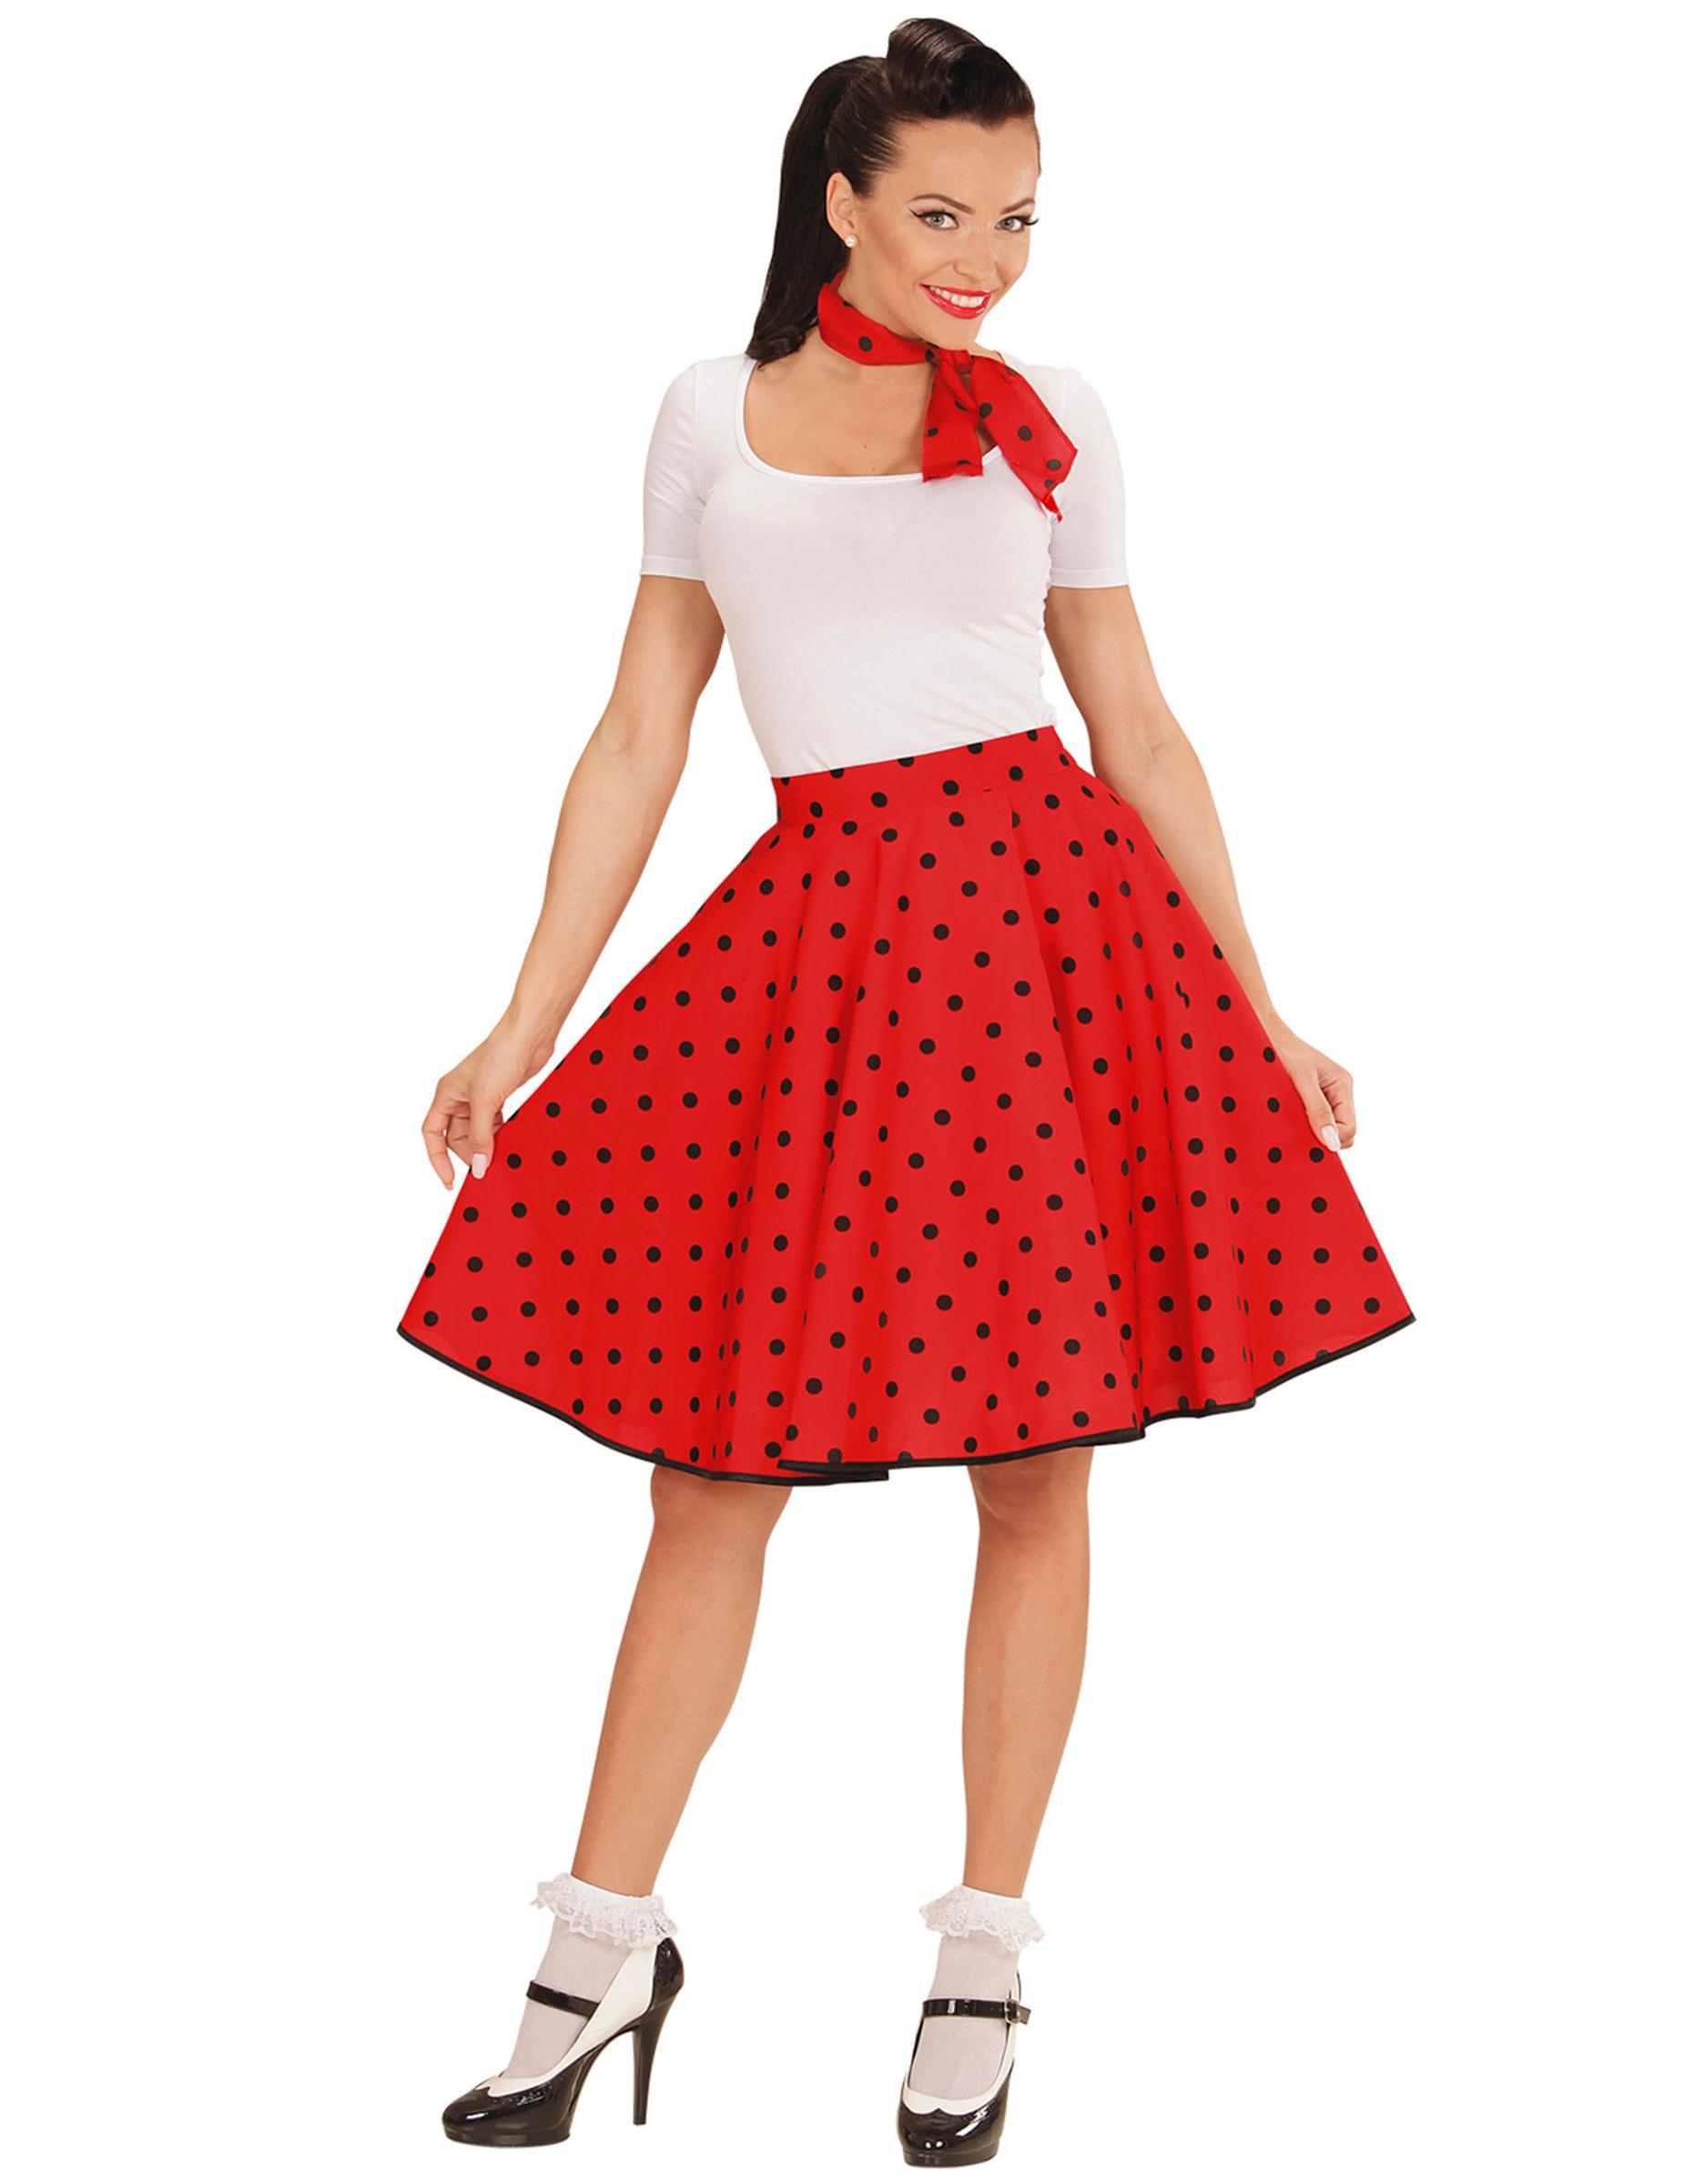 Rode jaren 50 jurk